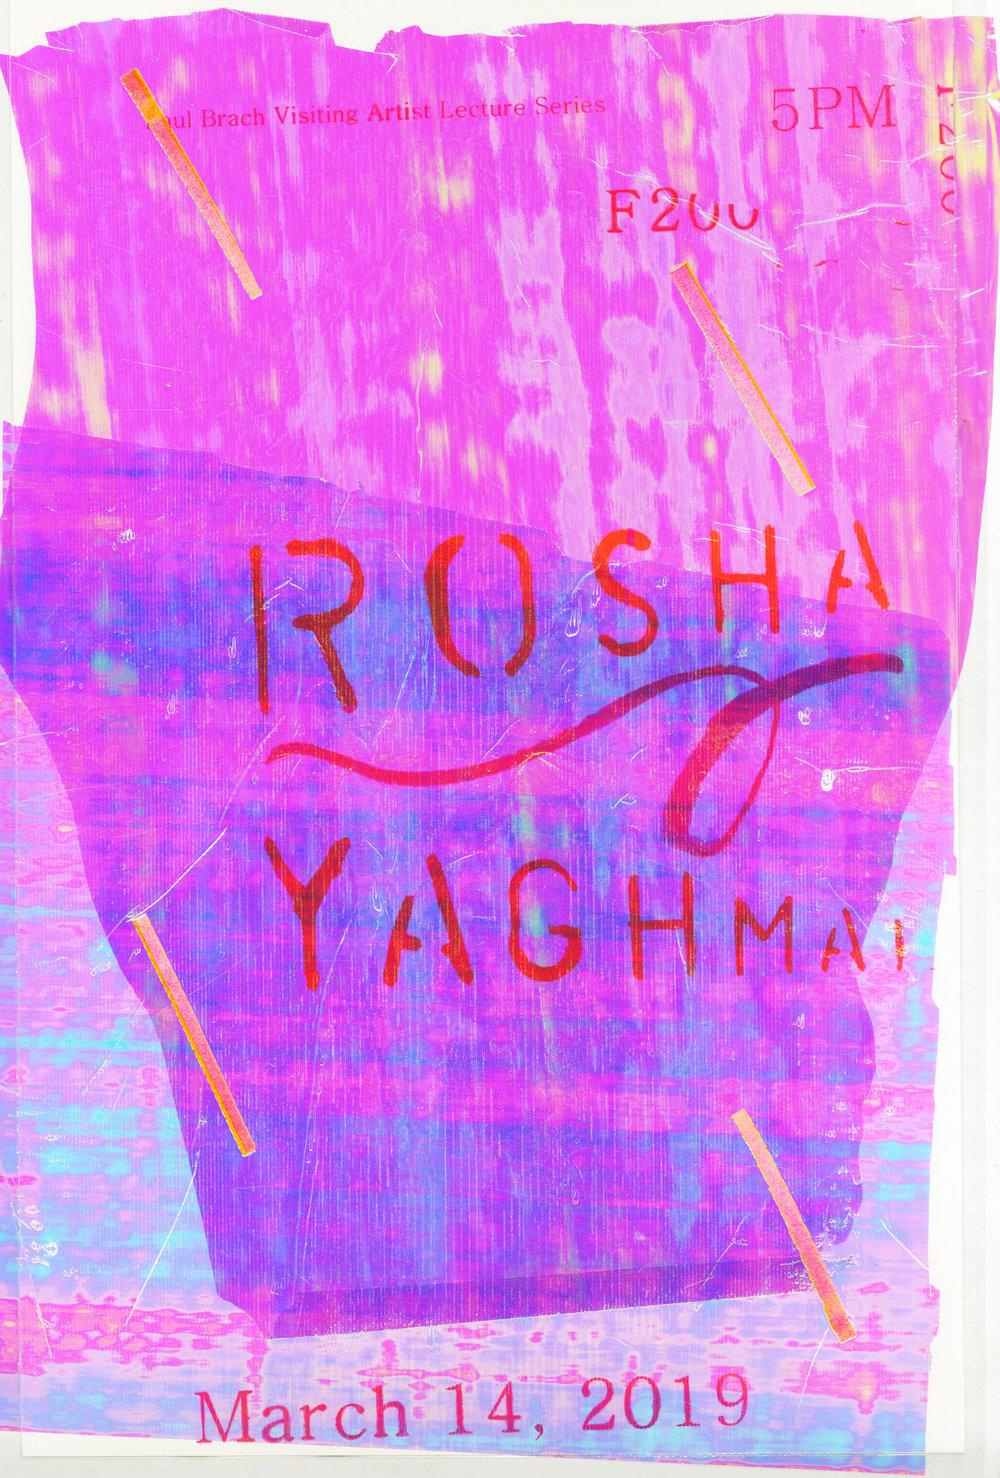 RoshaYaghmai1